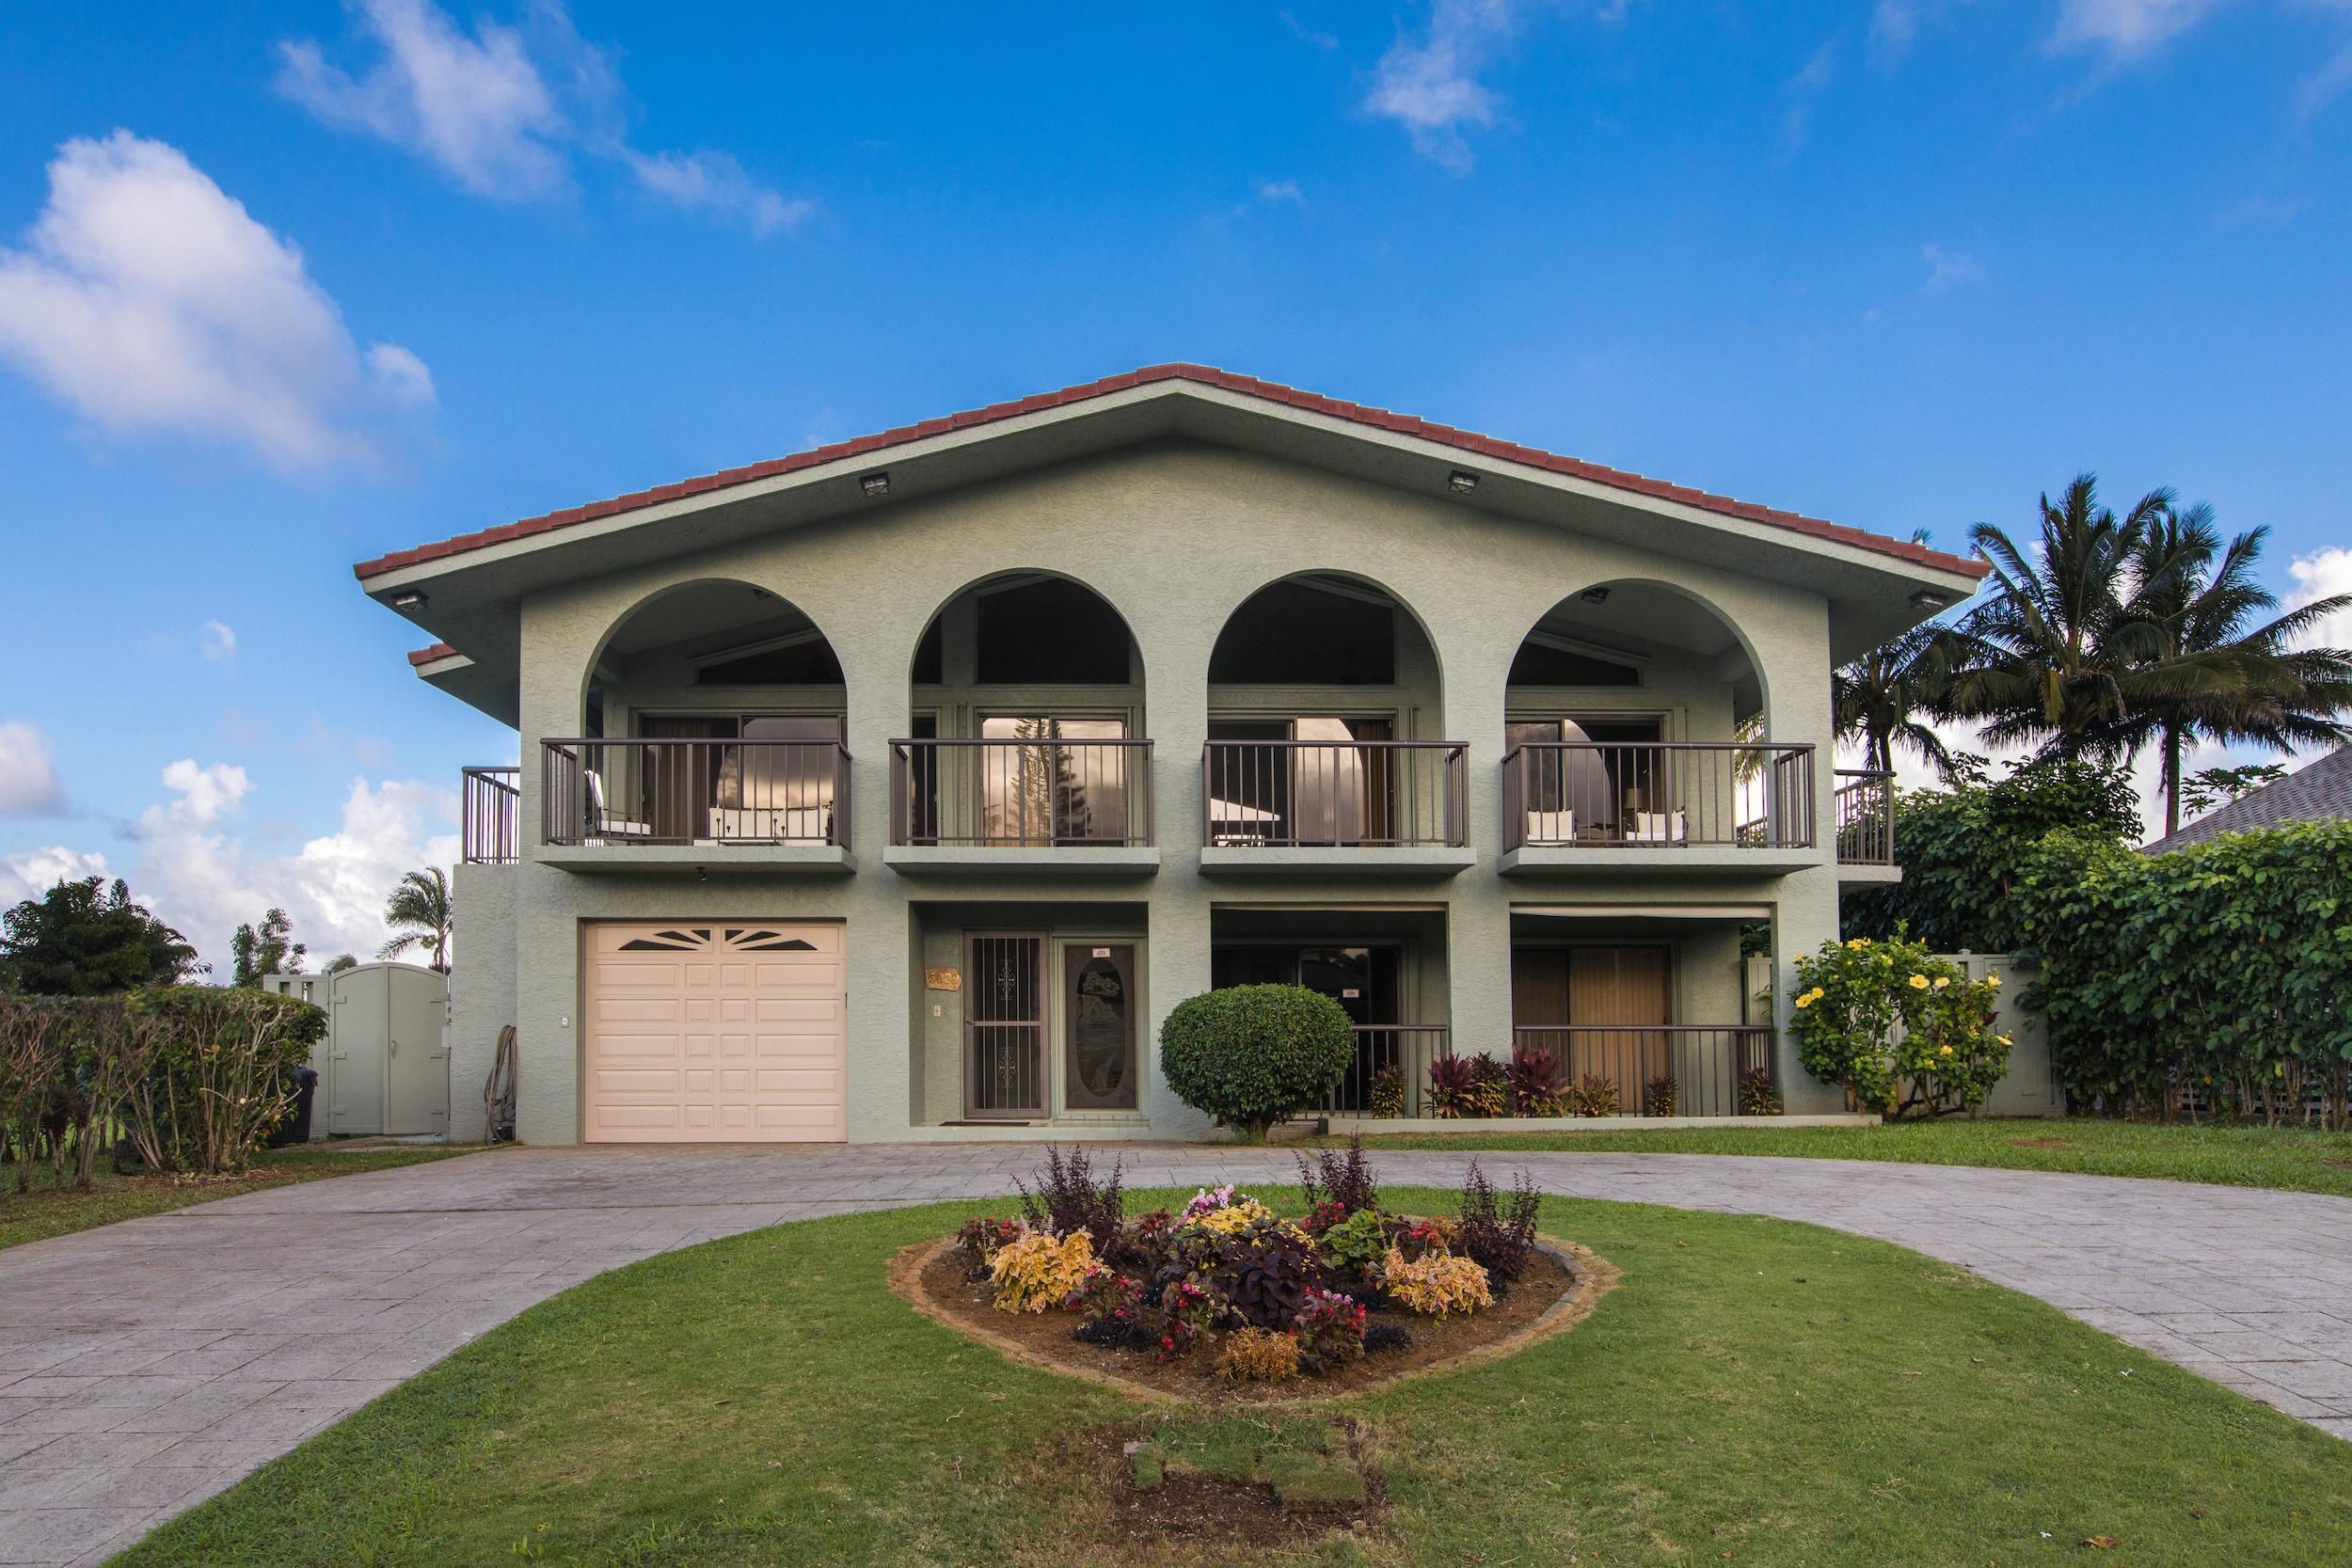 Single Family Home for Sale at Princeville 5029 Emmalani Dr Princeville, Hawaii, 96722 United States